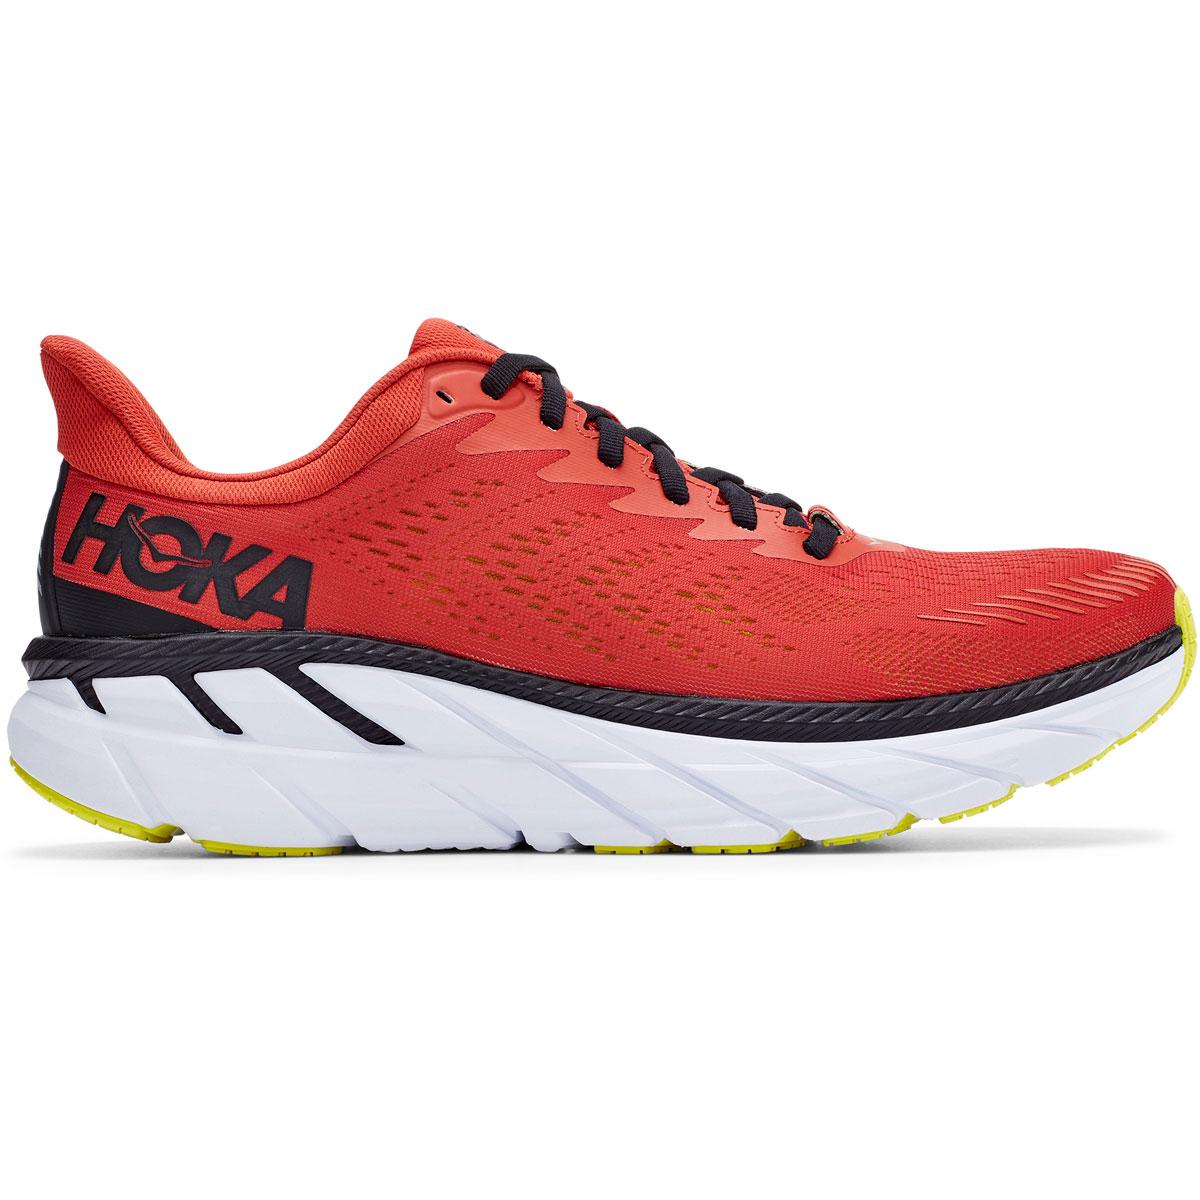 Men's Hoka One One Clifton 7 Running Shoe - Color: Chili/Black - Size: 9 - Width: Regular, Chili/Black, large, image 1